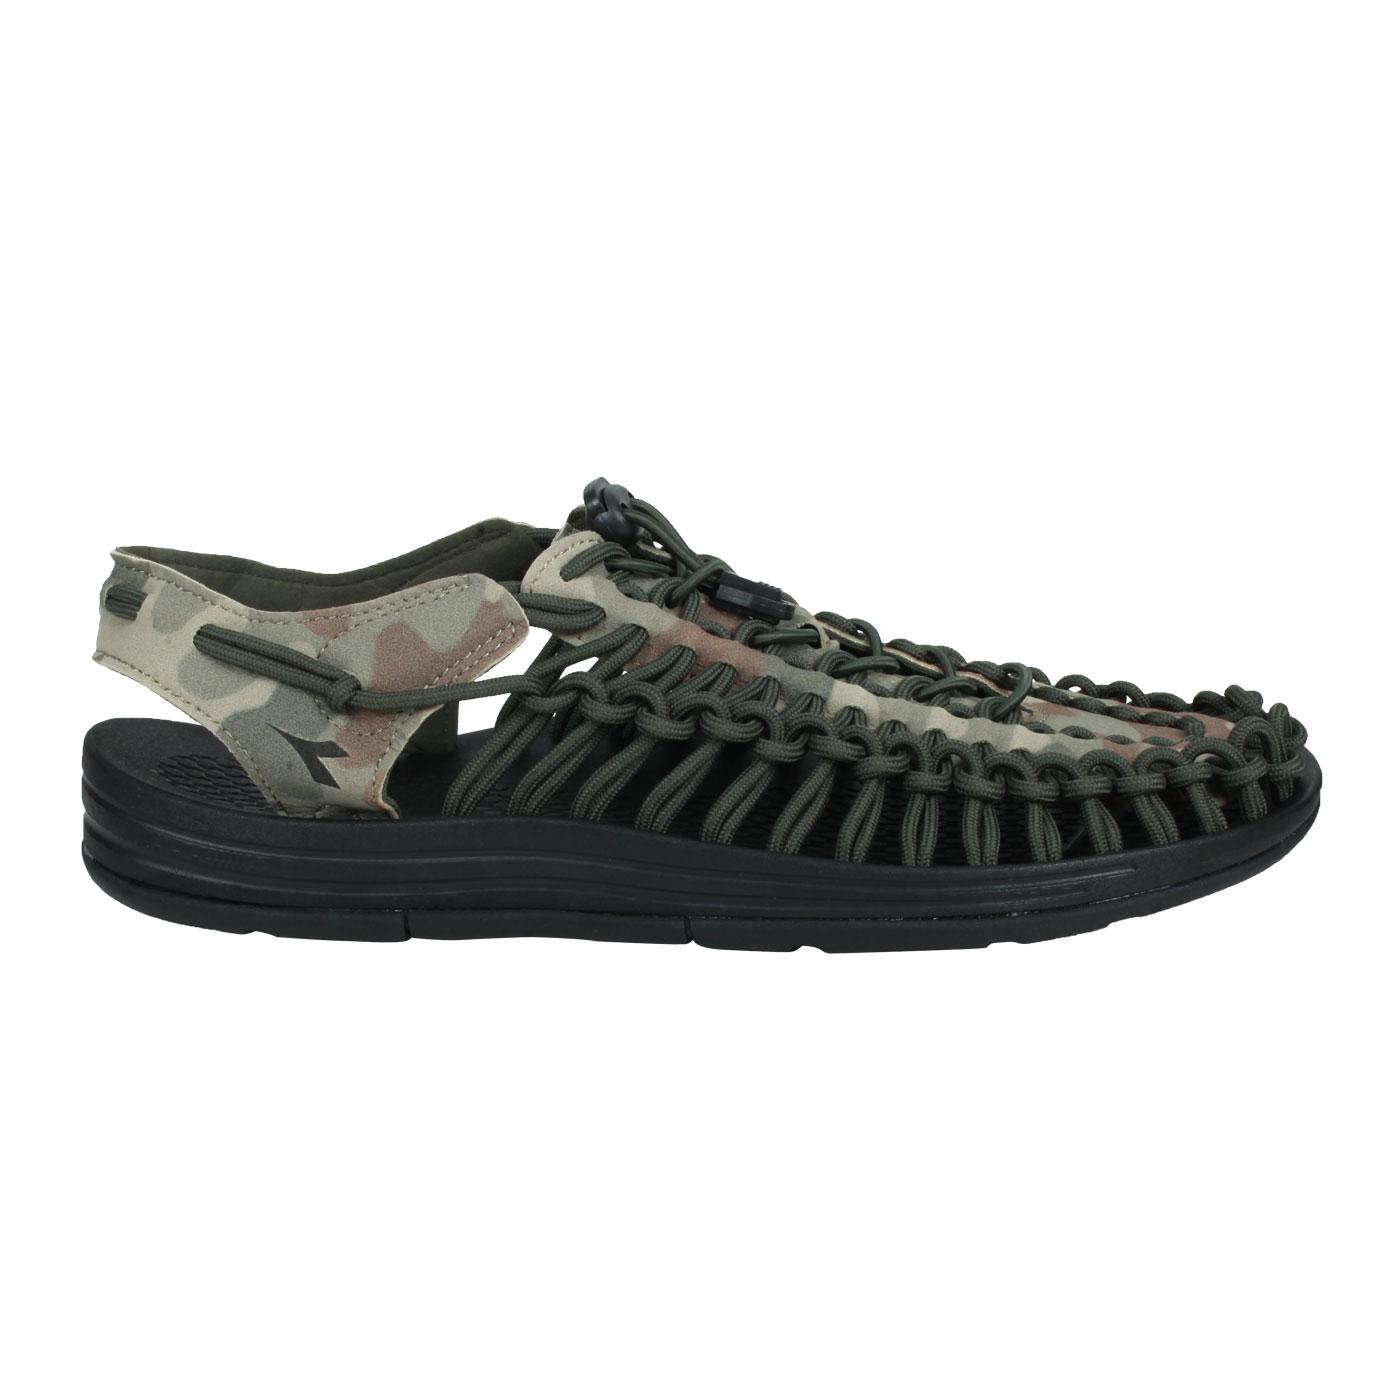 DIADORA 男款編織涼鞋 DA71205